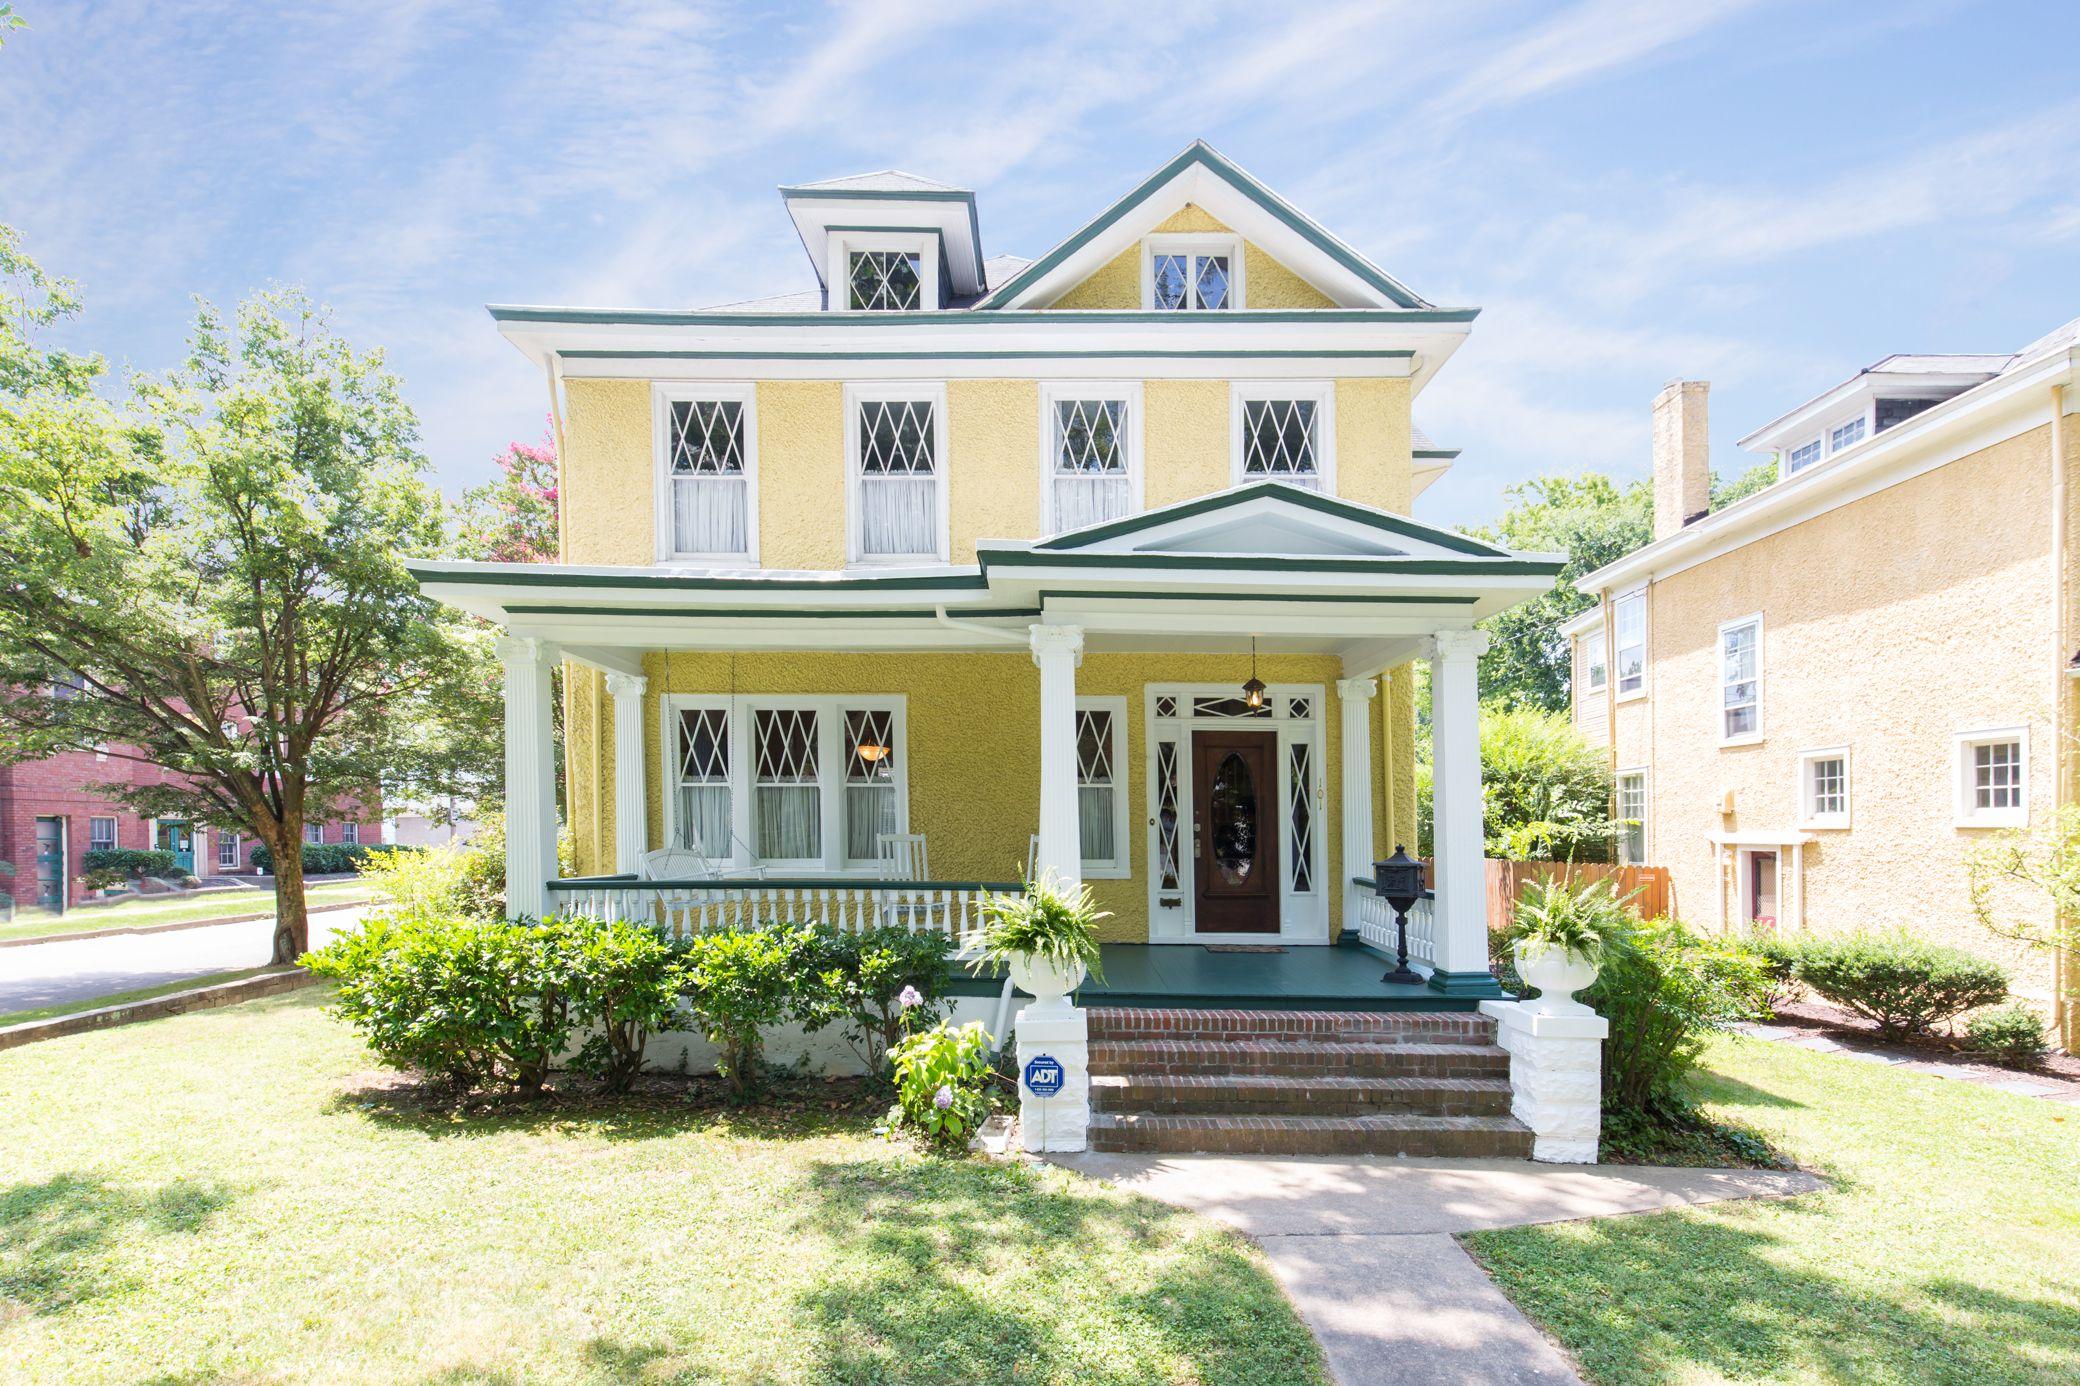 0dbcf7bcaba3db26760d30abf63dc8de - Better Homes And Gardens Real Estate Richmond